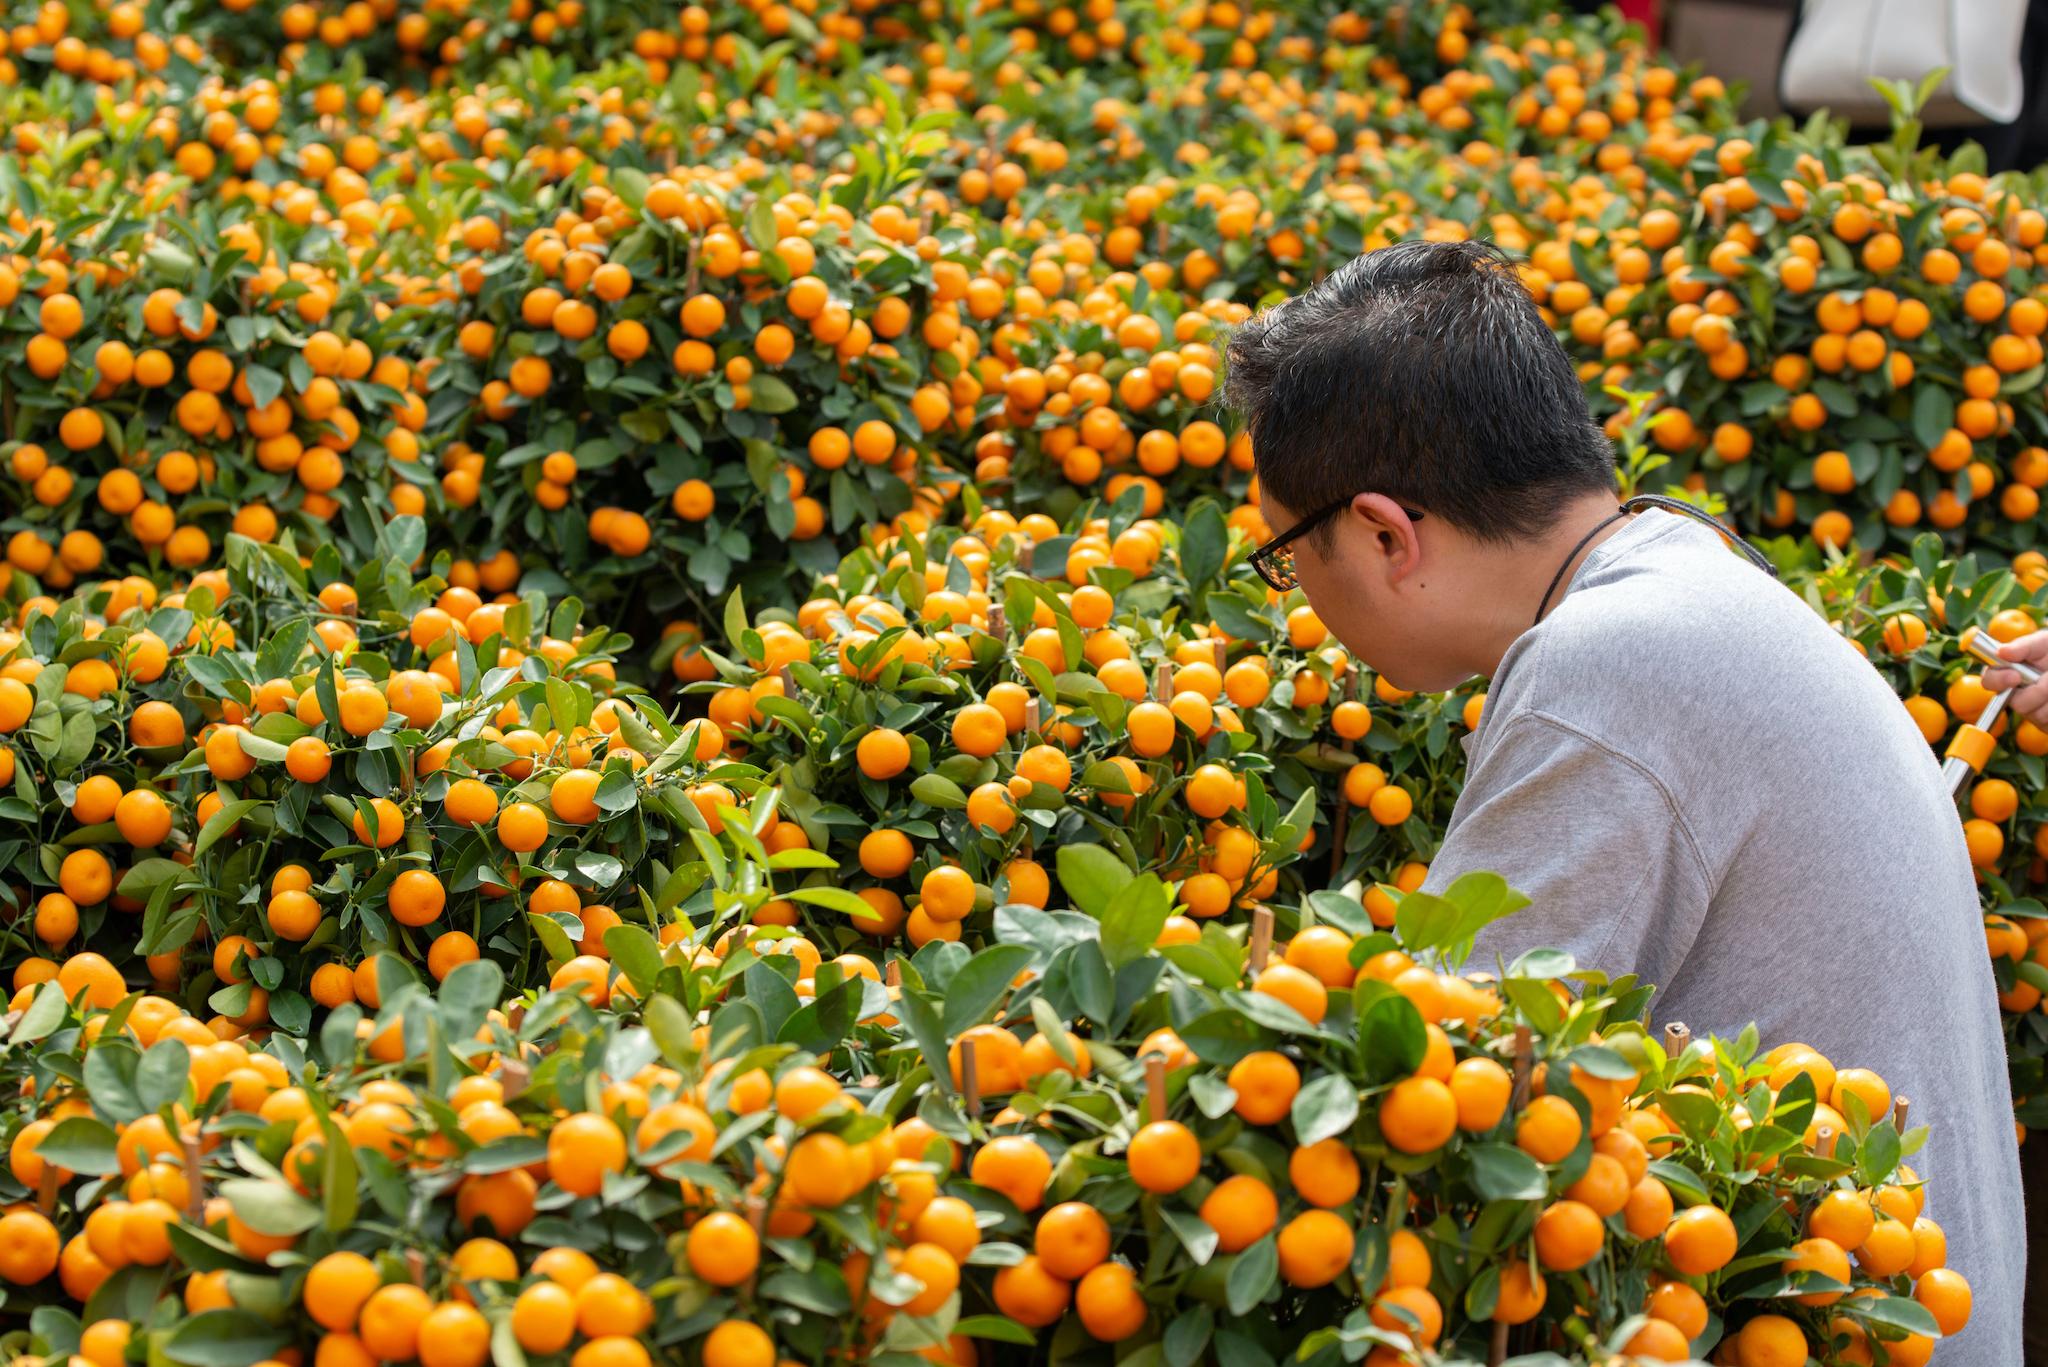 CNY Mandarins and tangerines